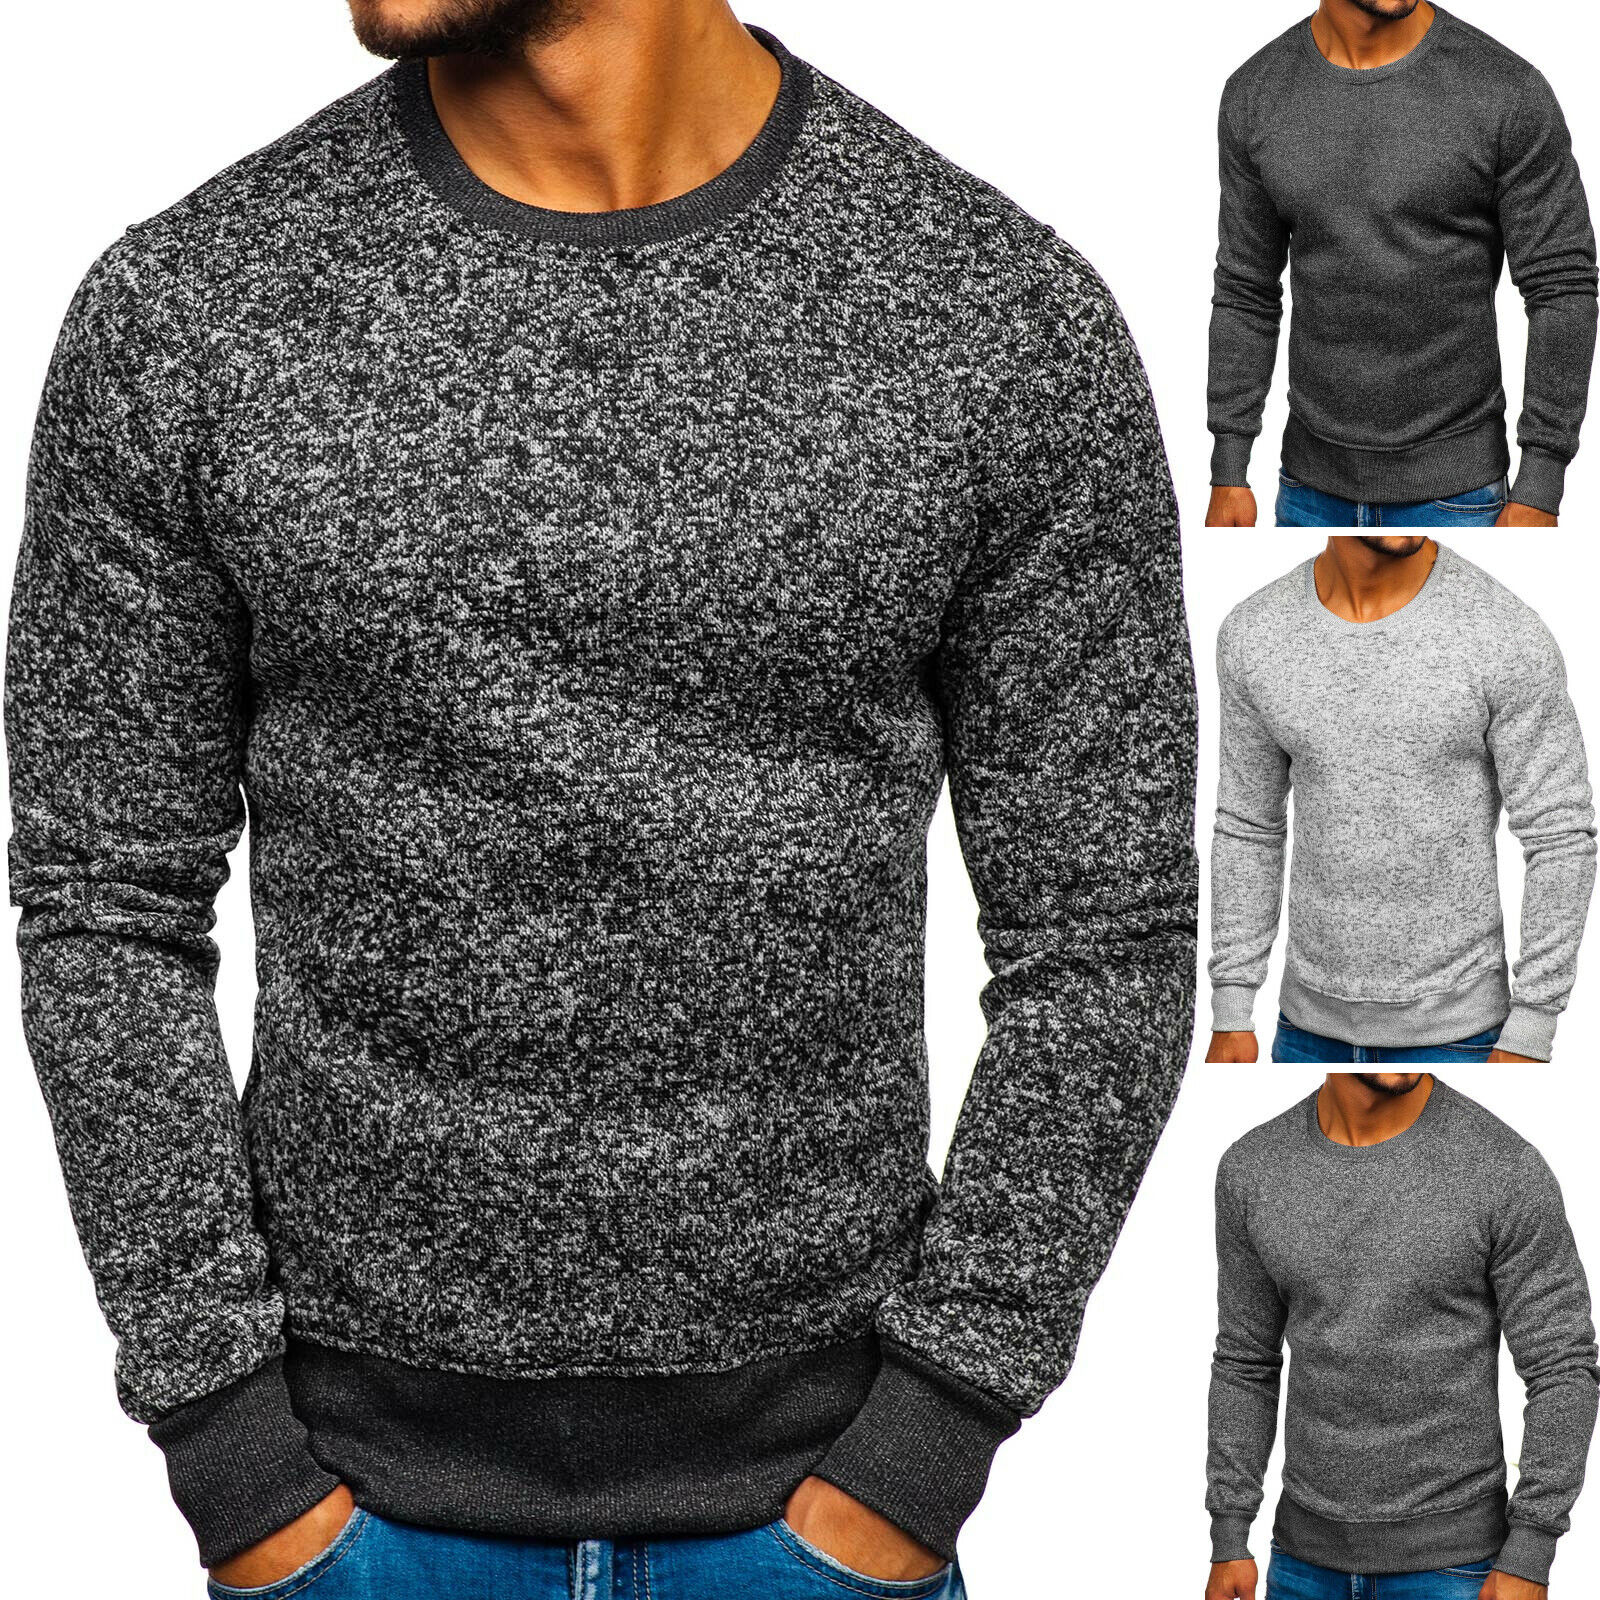 Sweatshirt Langarmshirt Pullover Pulli Rundhals Men Herren Mix BOLF 1A1 Classic